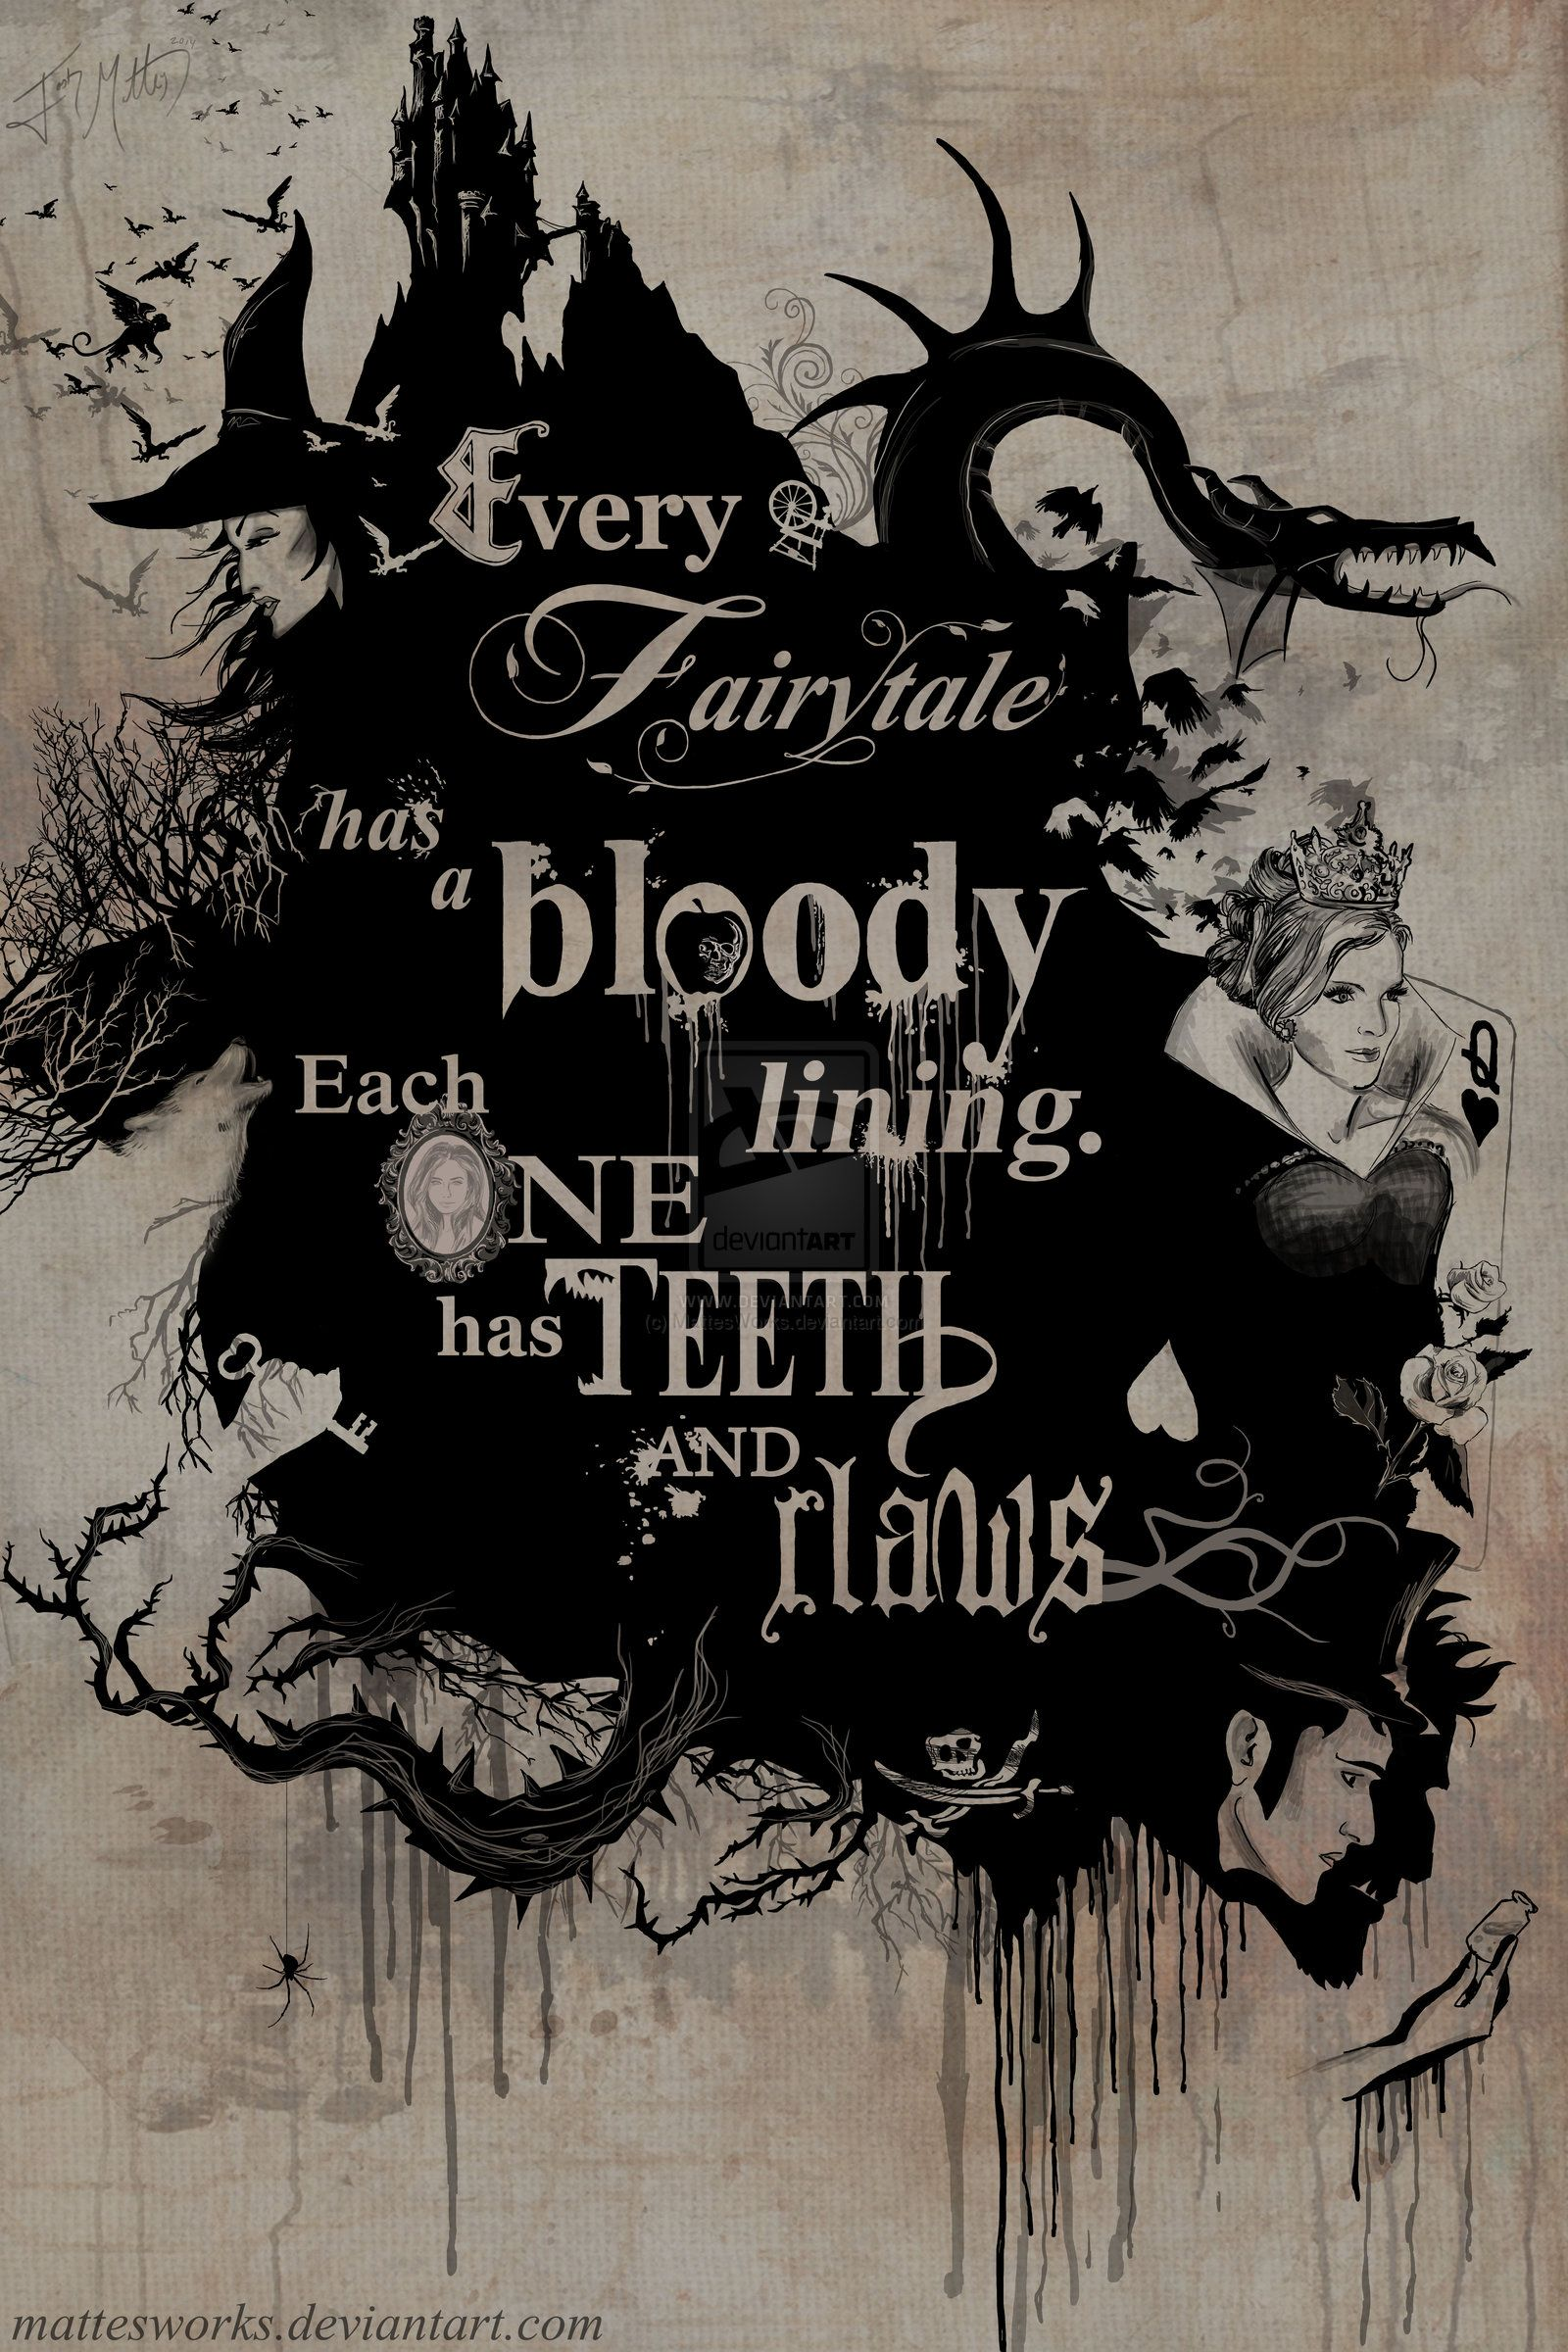 Fairytales Dragons 2 by MattesWorks.deviantart.com on @deviantART